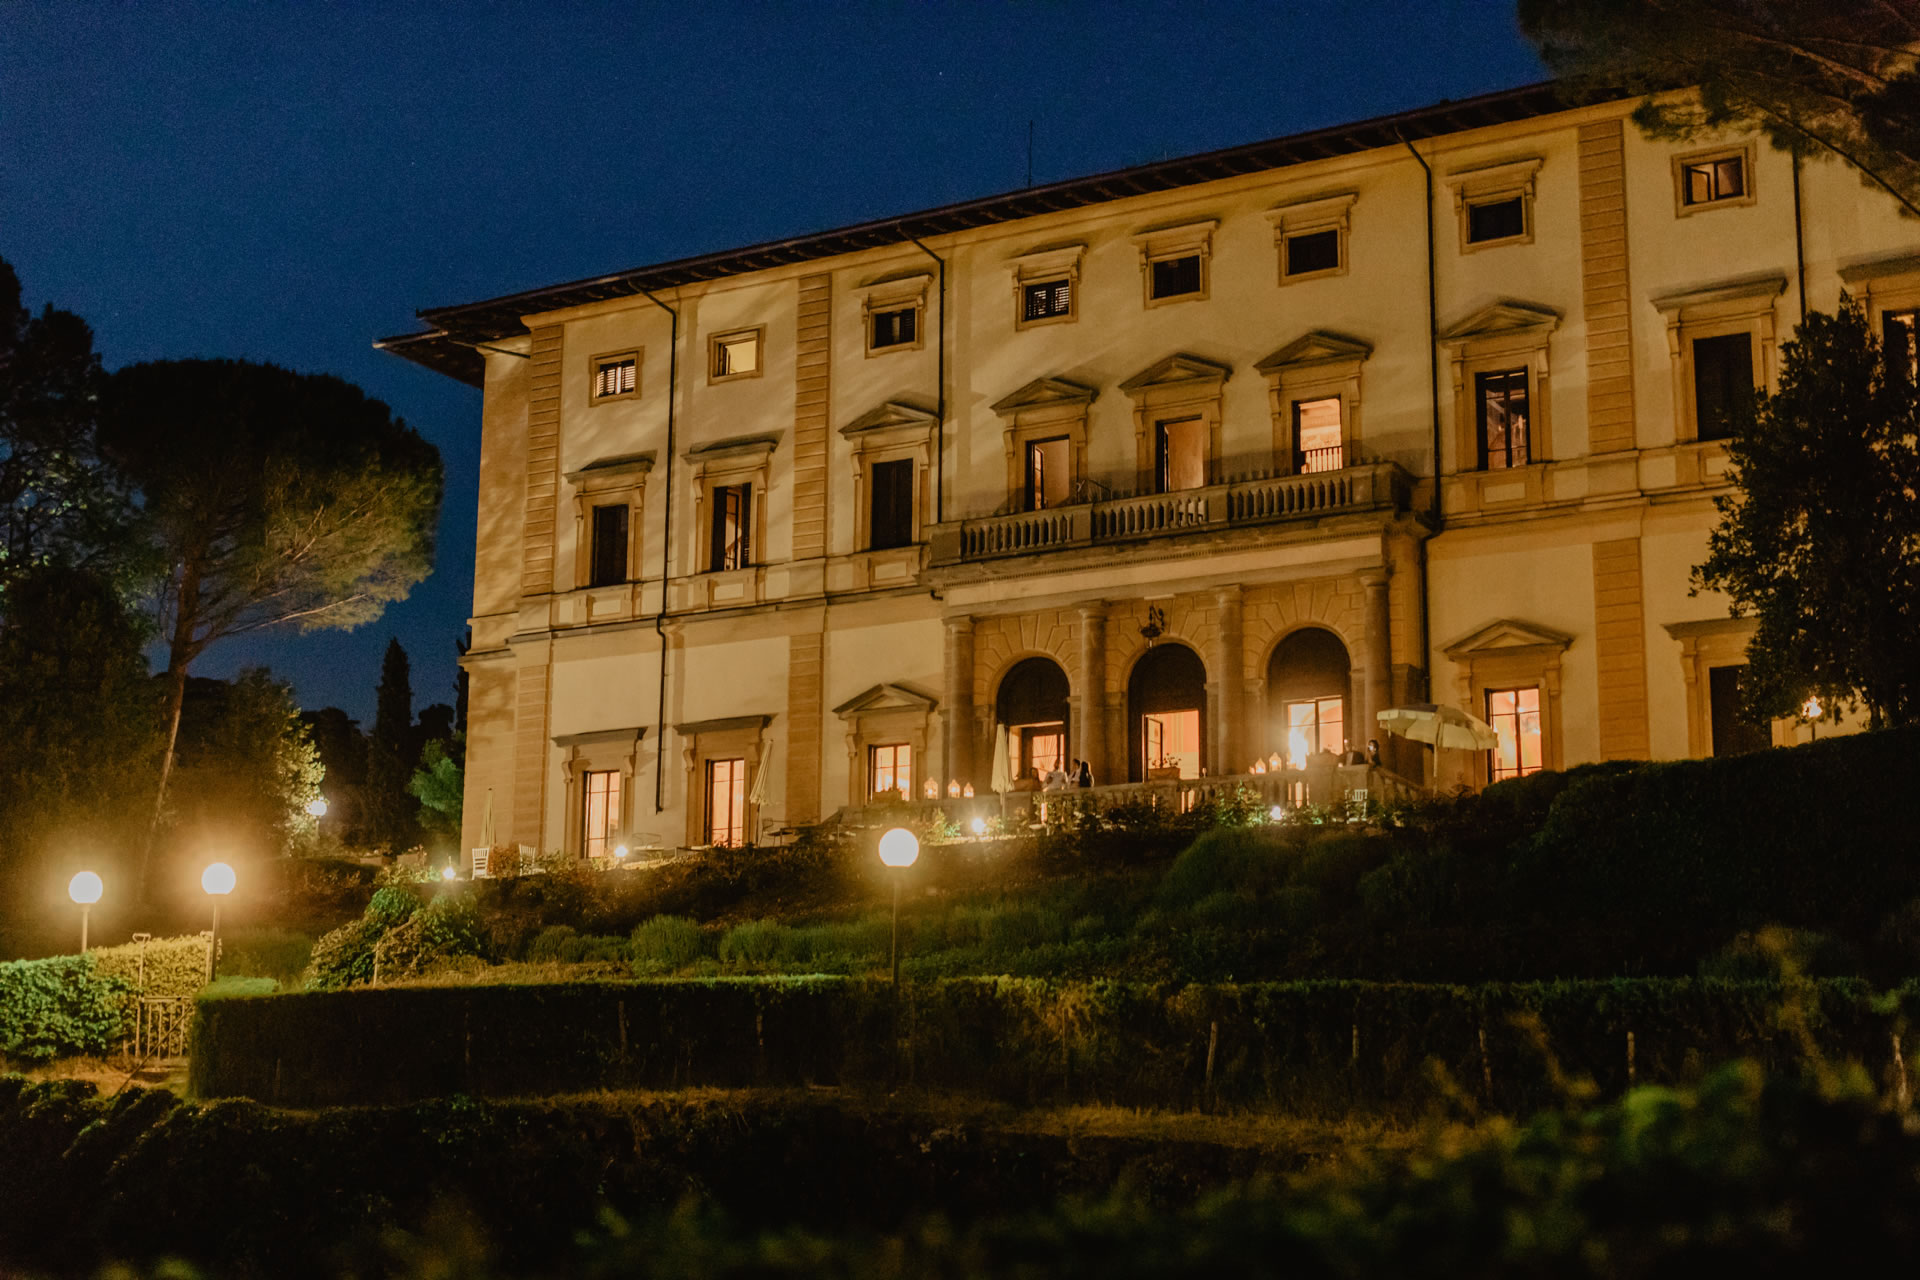 - 65 :: Indian wedding ceremony at Villa Pitiana :: Luxury wedding photography - 64 ::  - 65